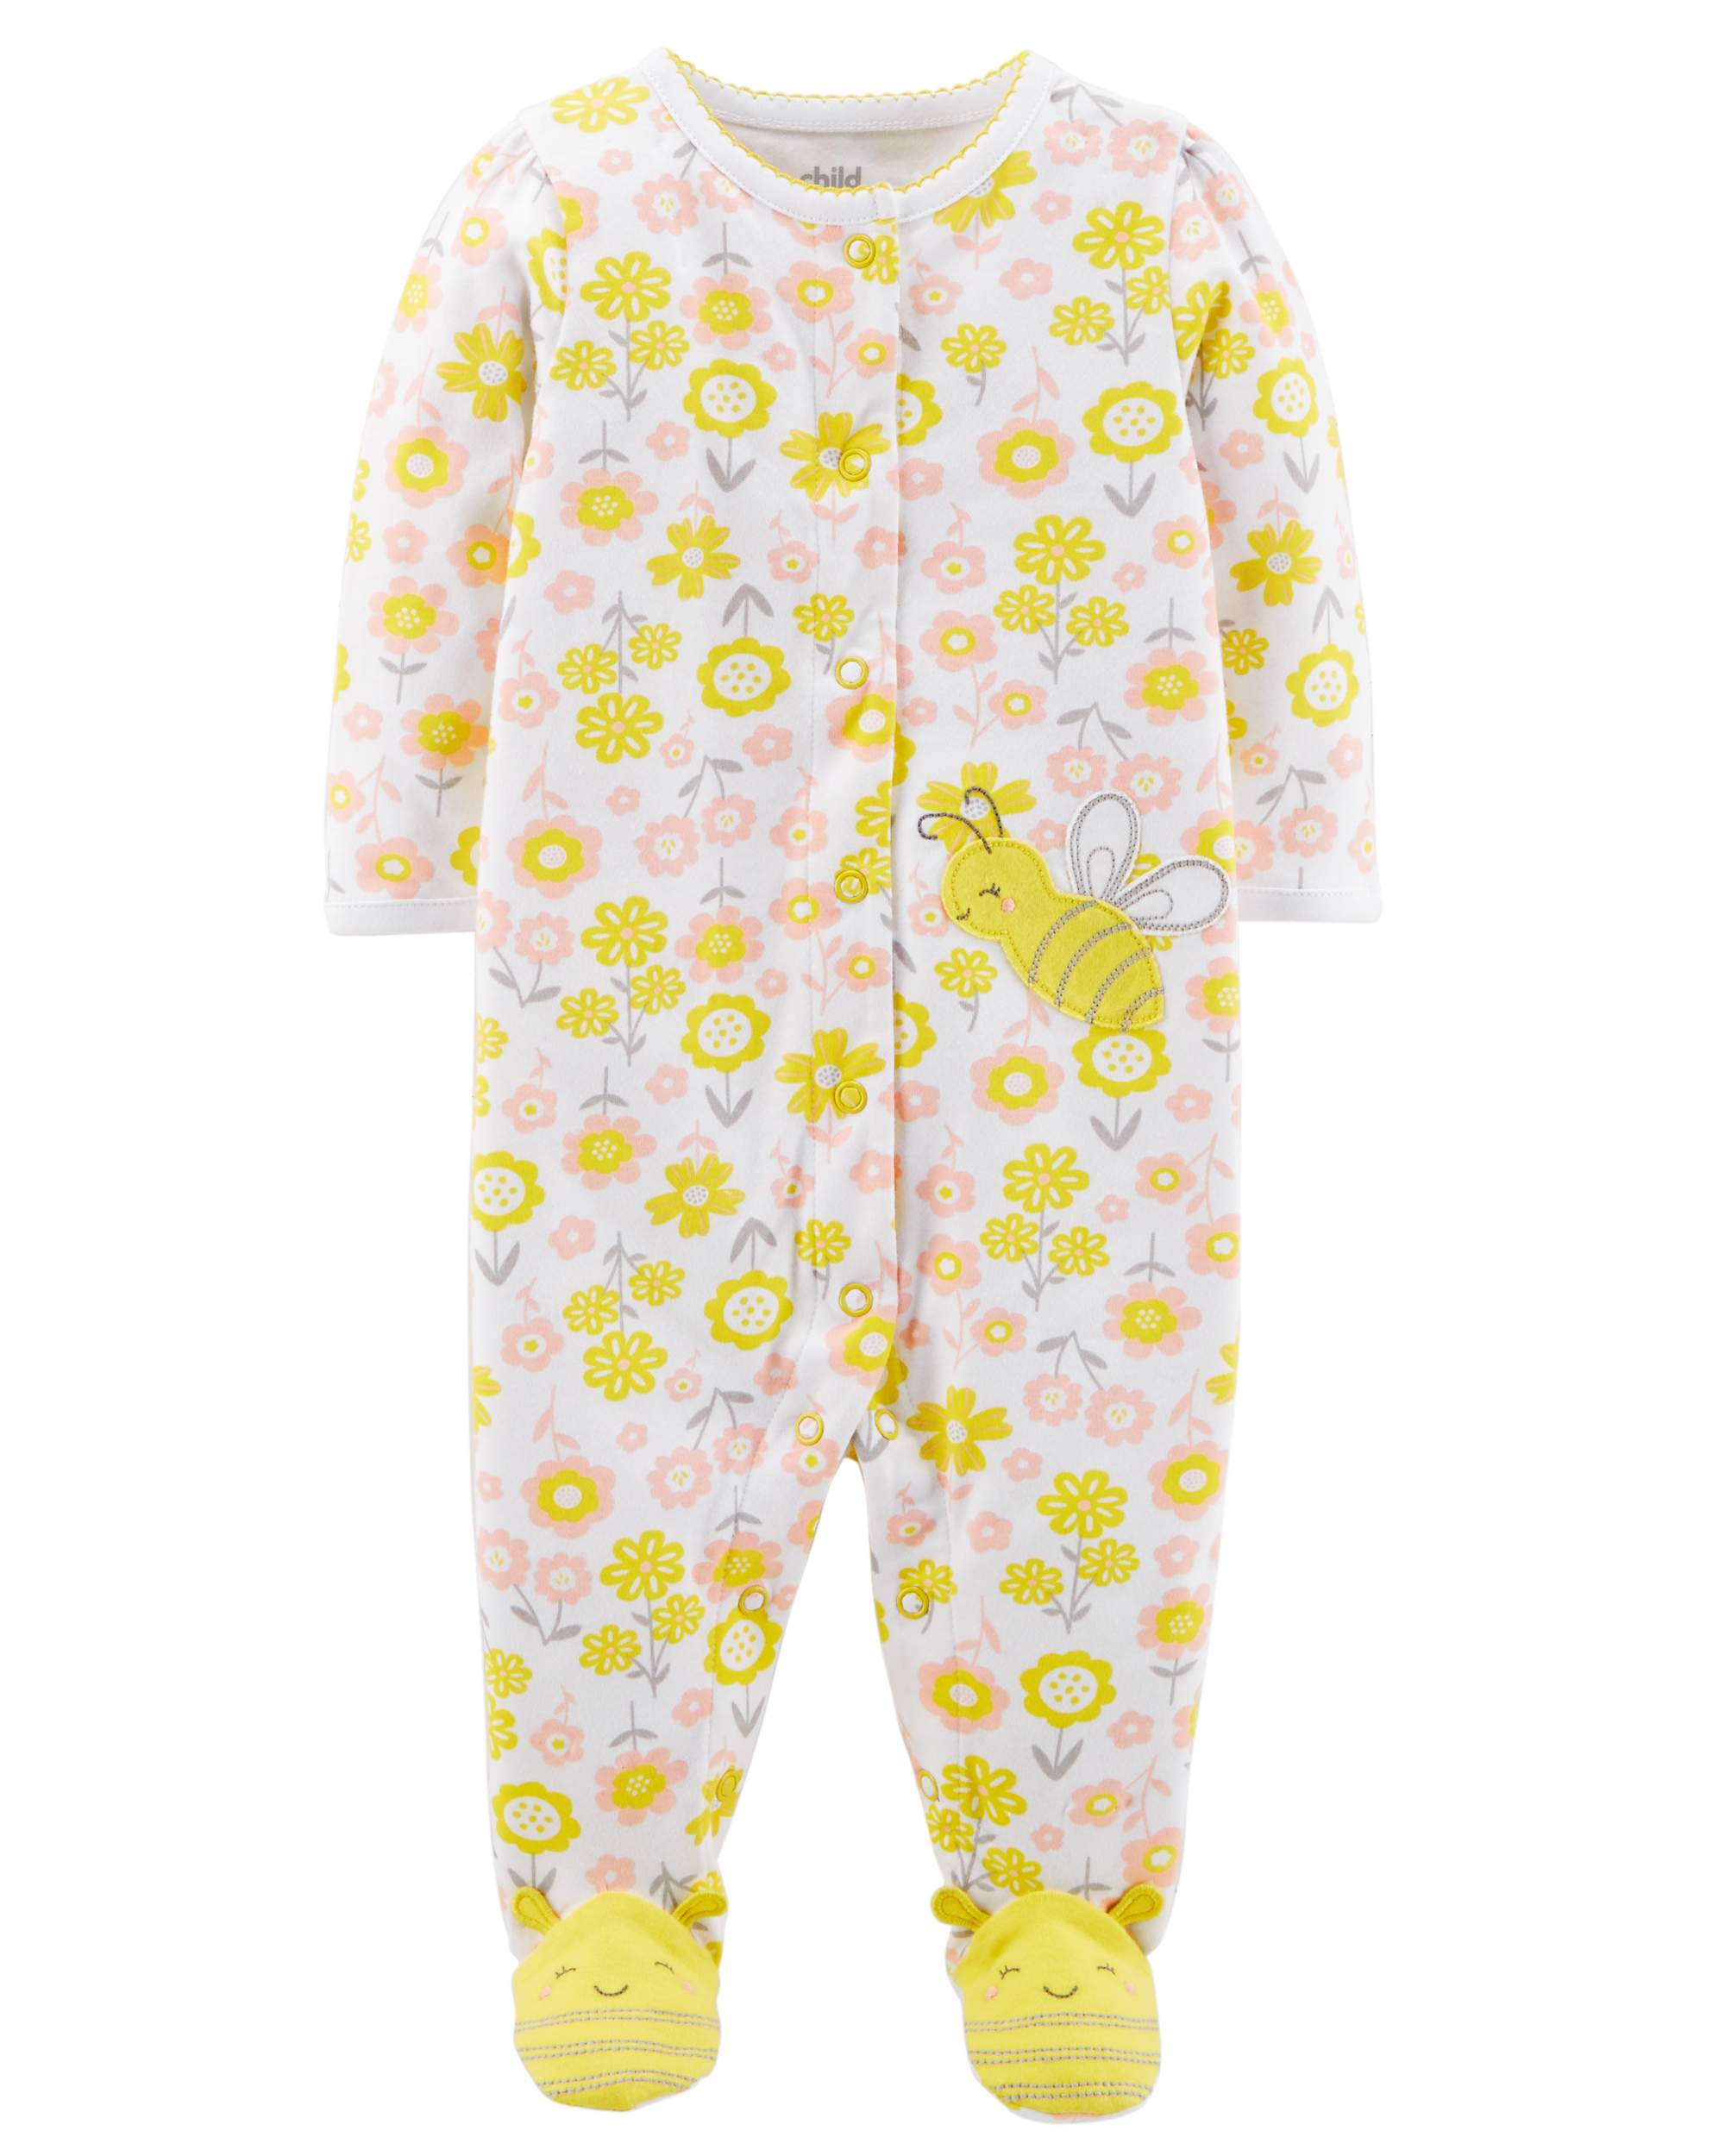 Baby Girl Button-up Sleep 'N Play